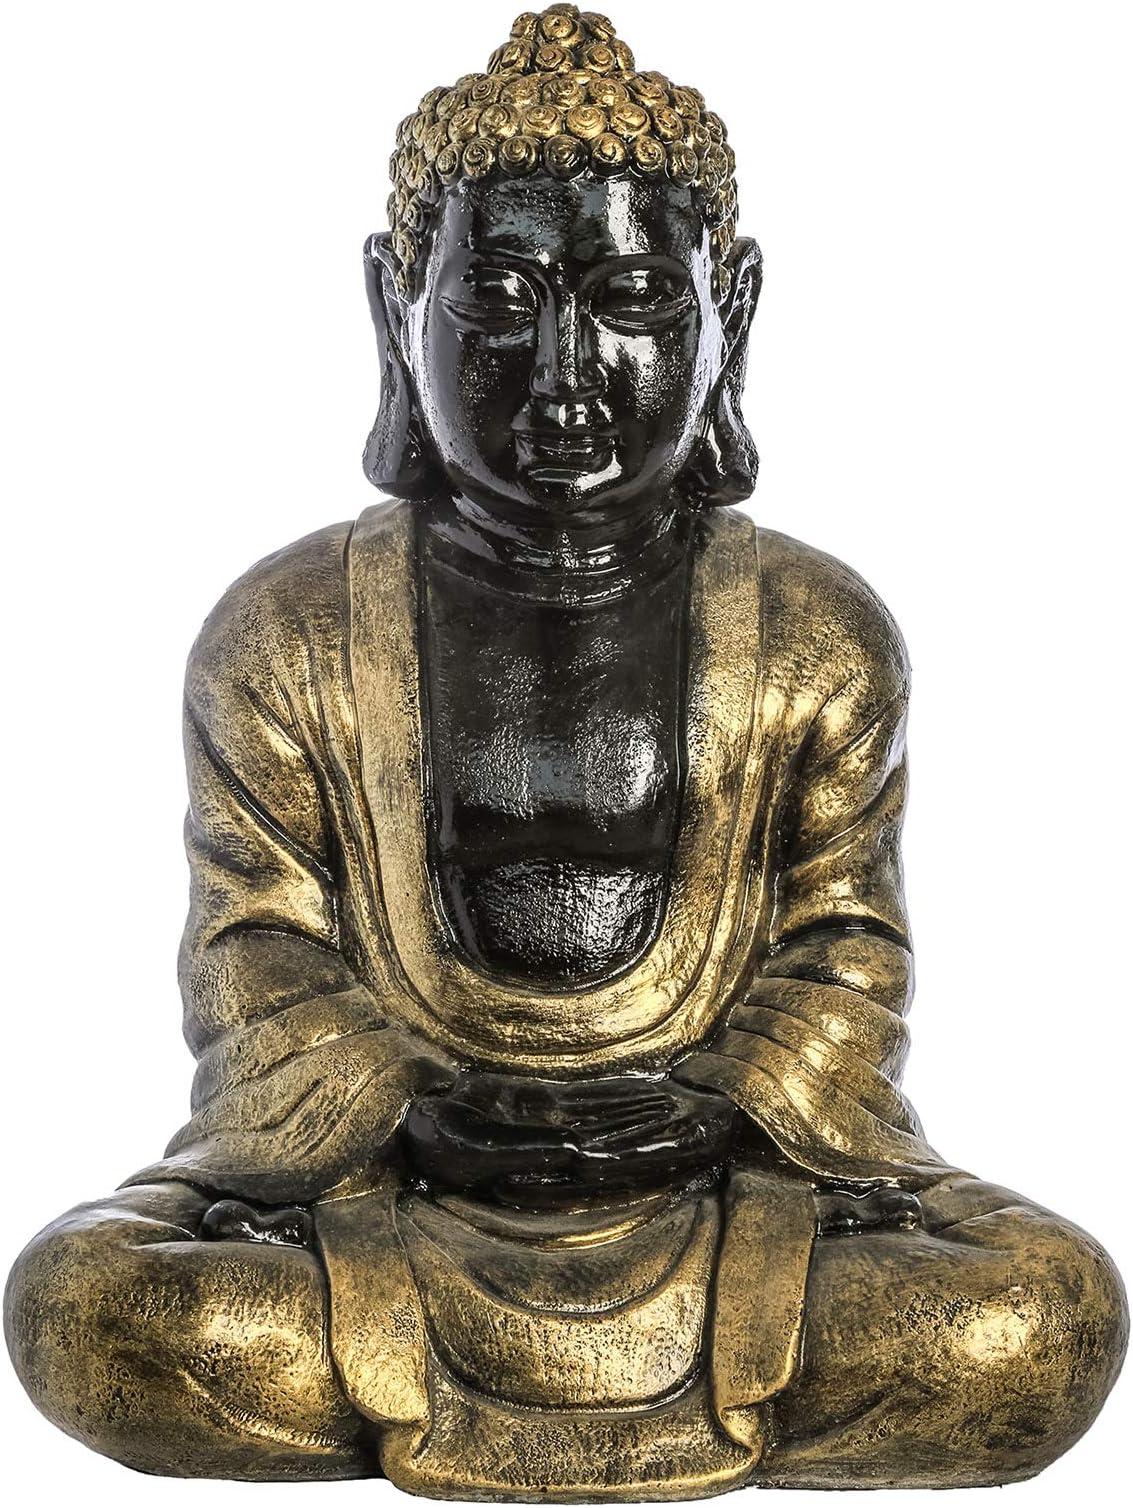 Garden Decoration Sitting Buddha Statue Metallic Fk715d Buda Tibetano Grande Dorado Price In Uae Amazon Uae Kanbkam